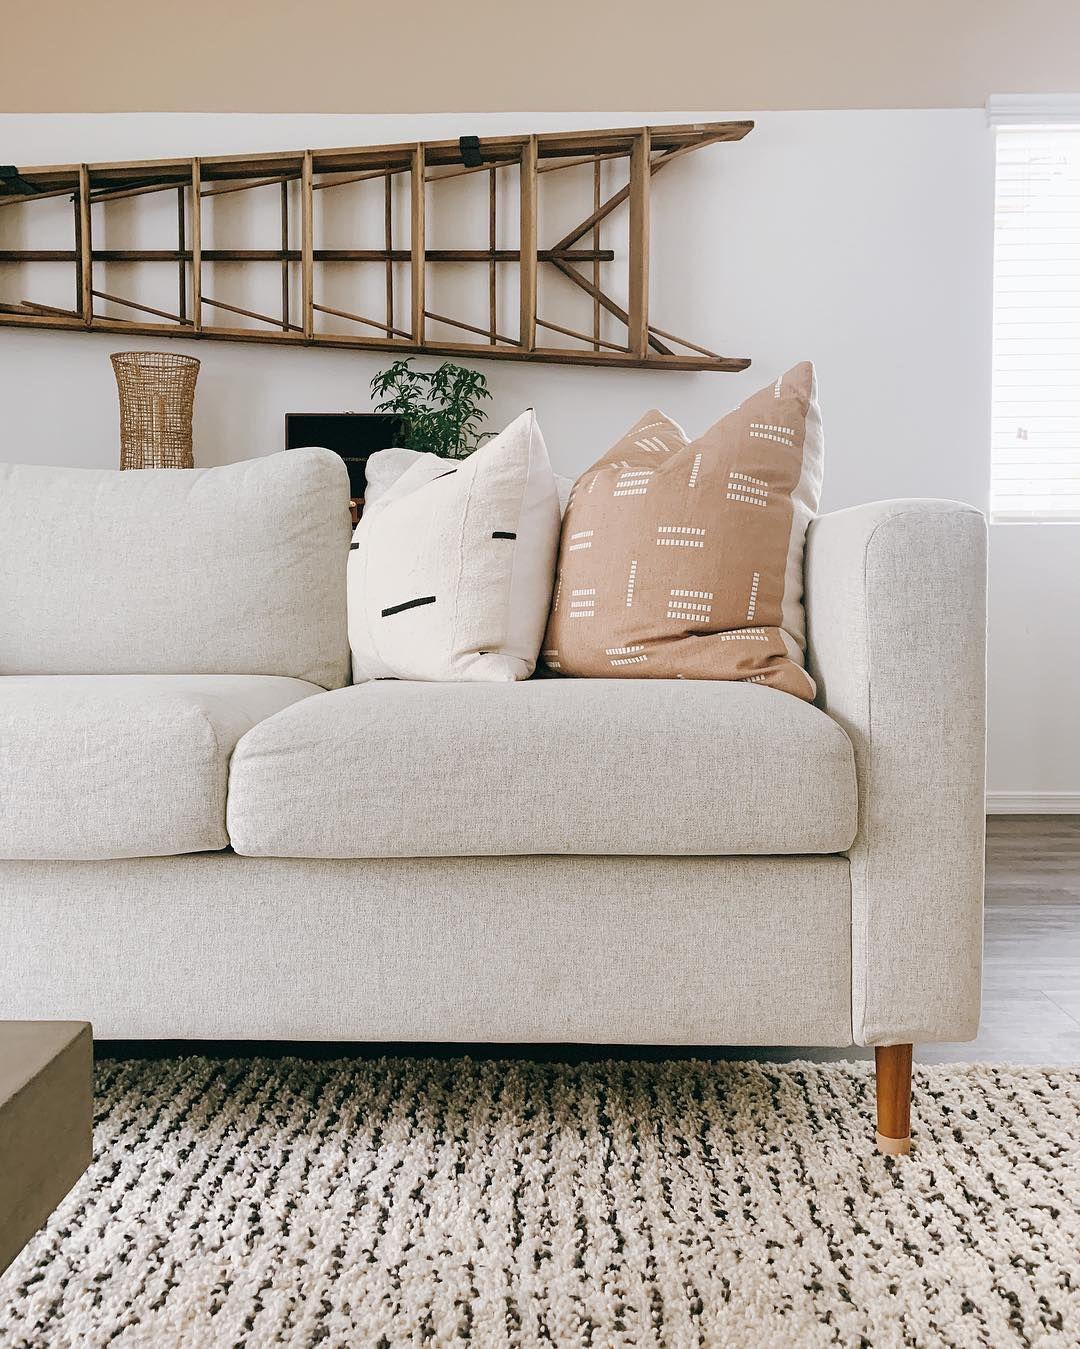 Ikea Vimle Sofa With Prettypegs Carl 170 Teak With Leather Socks